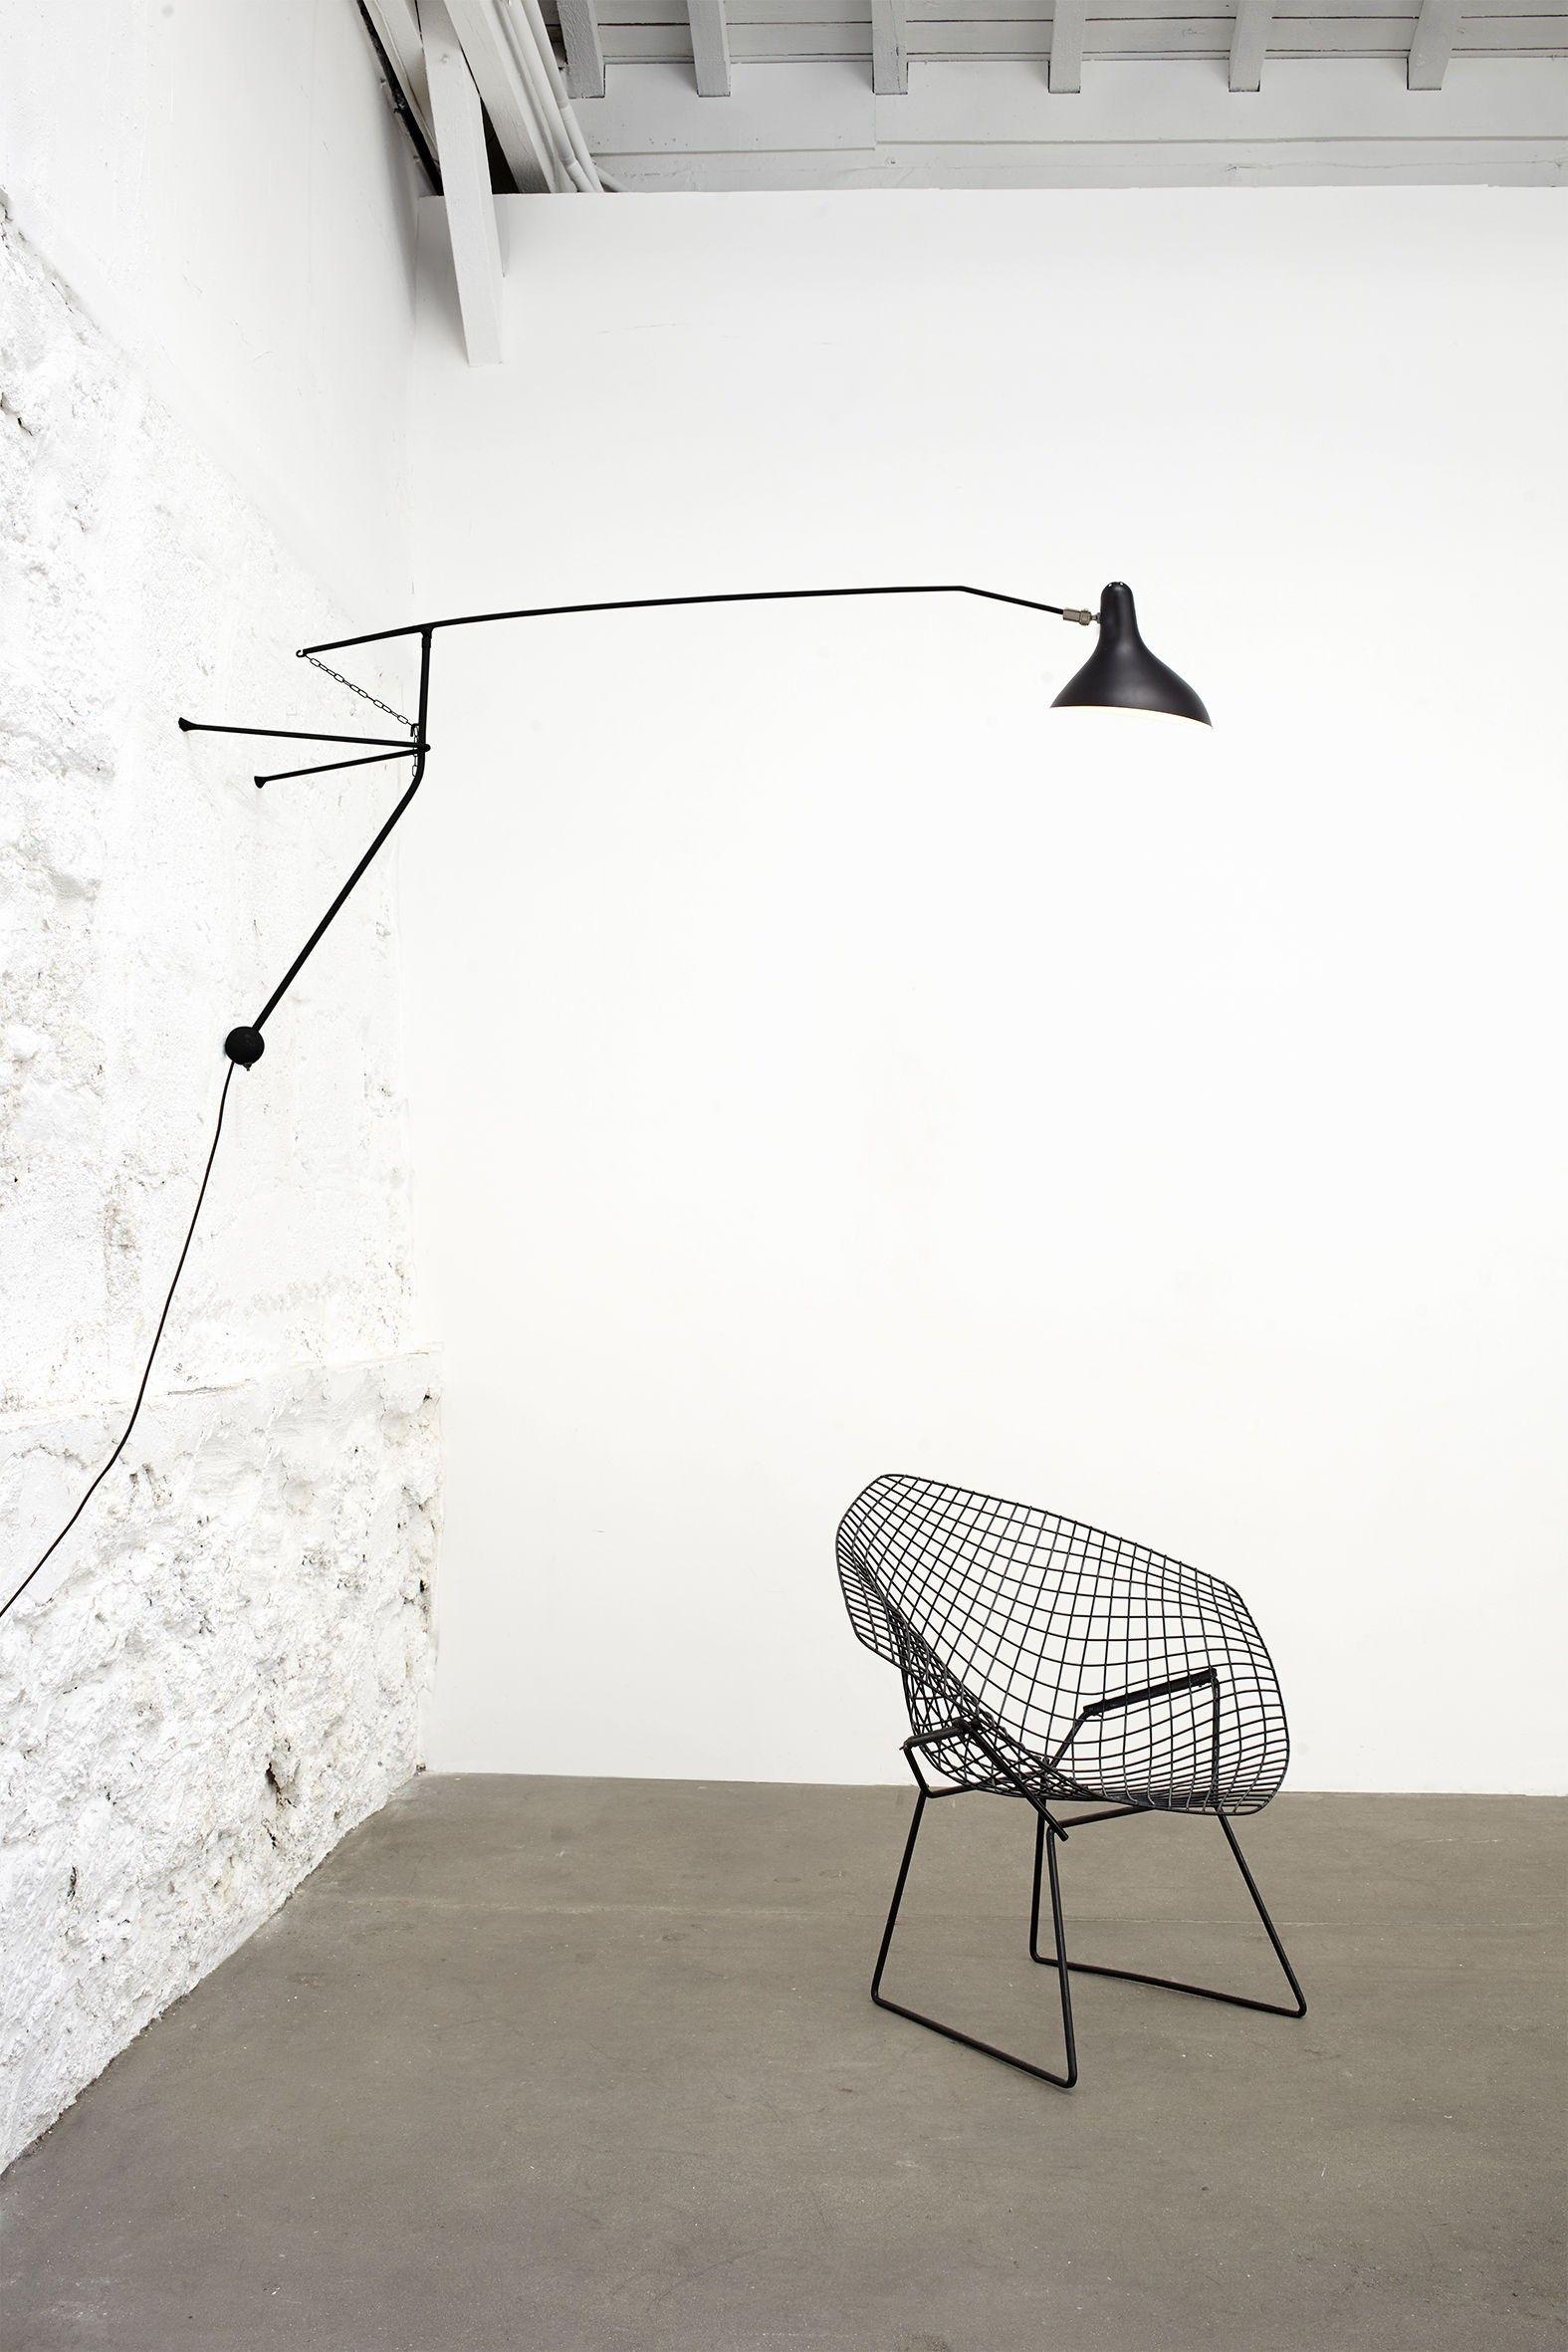 voltex paris free voltex luminaire base copper applique tom base voltex luminaire paris with. Black Bedroom Furniture Sets. Home Design Ideas